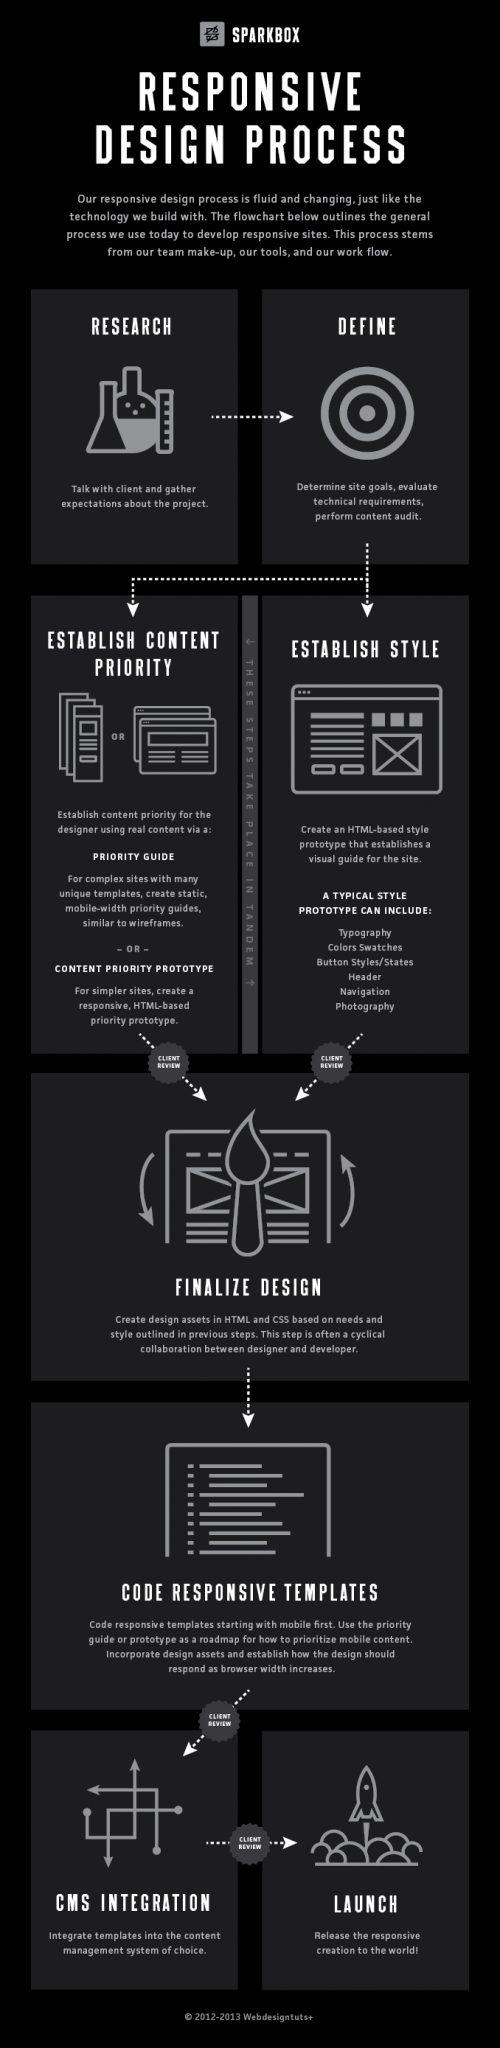 Process Responsive Design